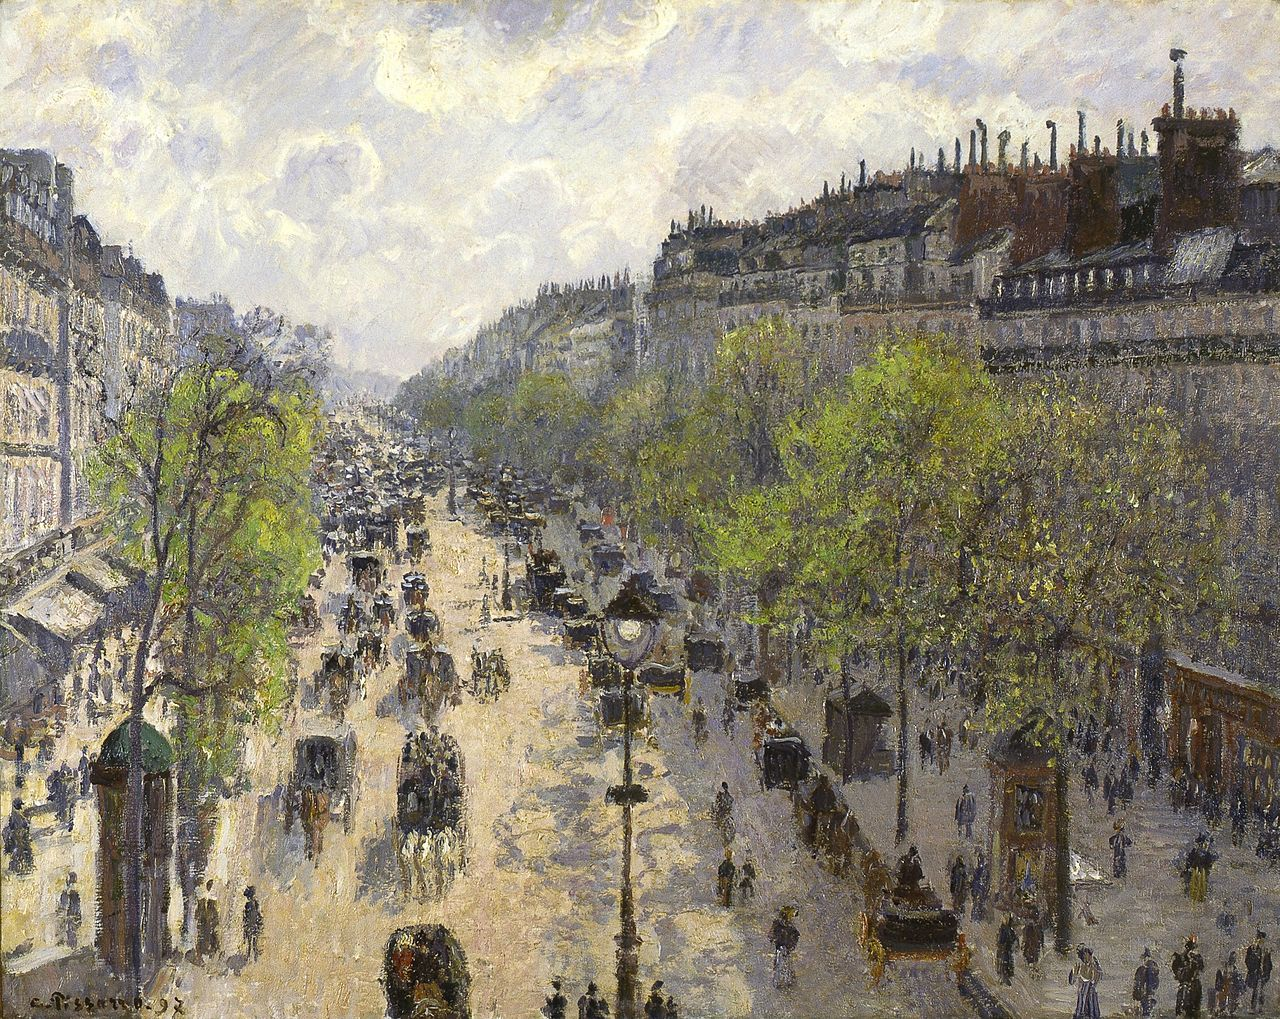 Camille_Pissarro_-_Boulevard_Montmartre,_Spring_-_Google_Art_Project